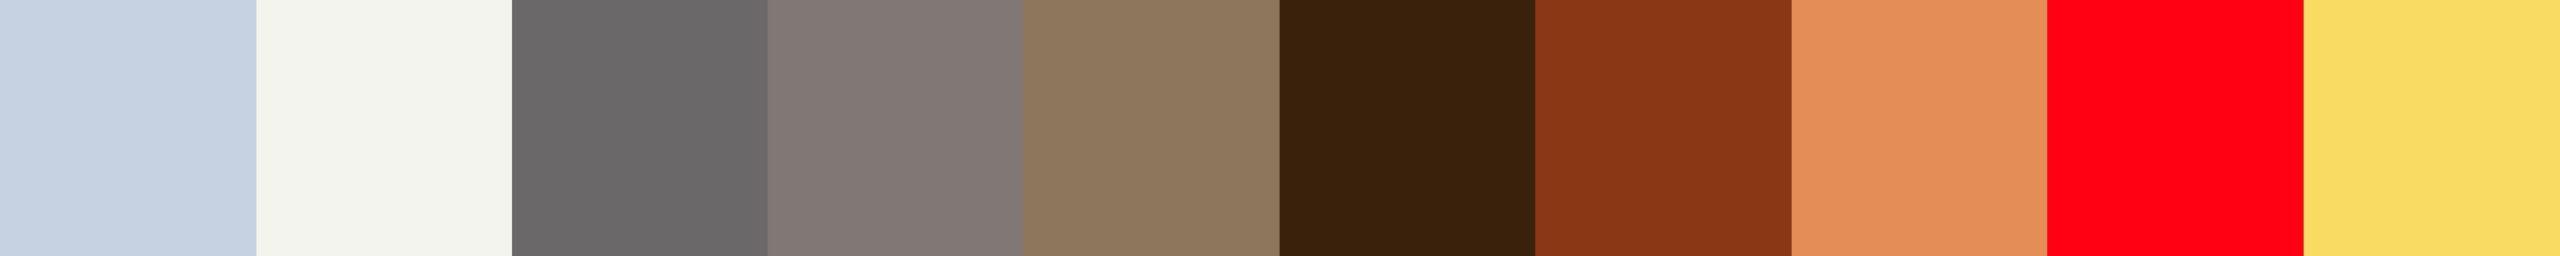 263 Vodehoria Color Palette